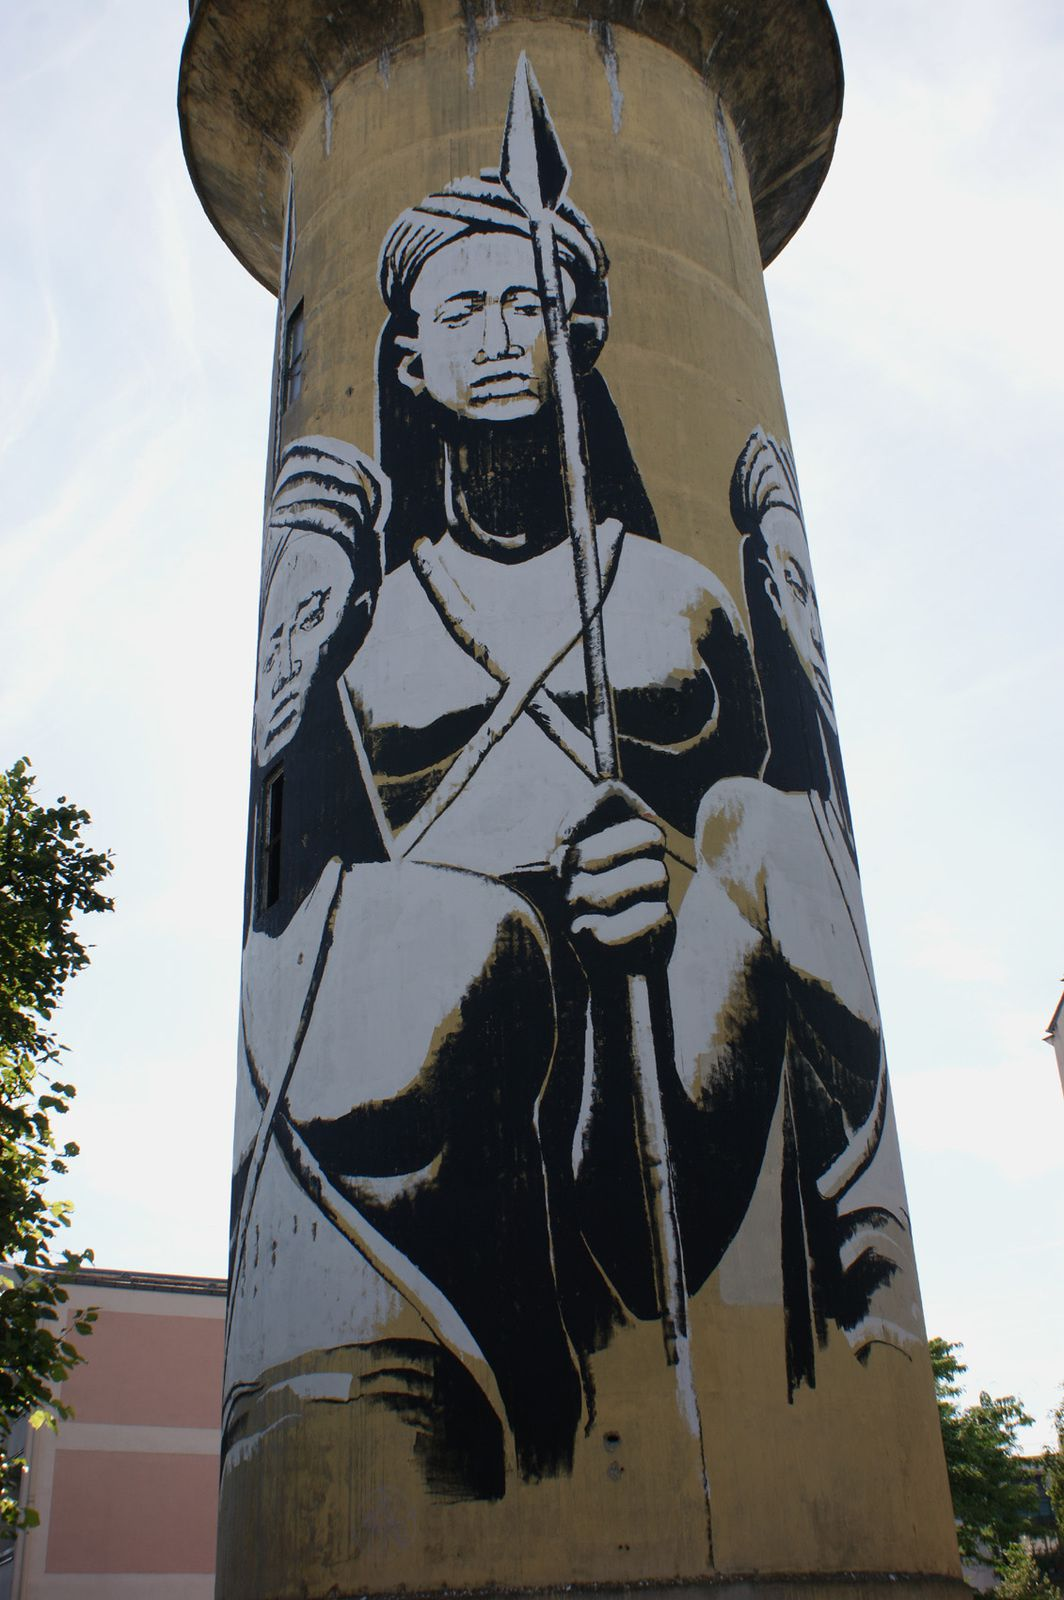 Street Art : Graffitis & Fresques Murales 93005 Aulnay sous bois